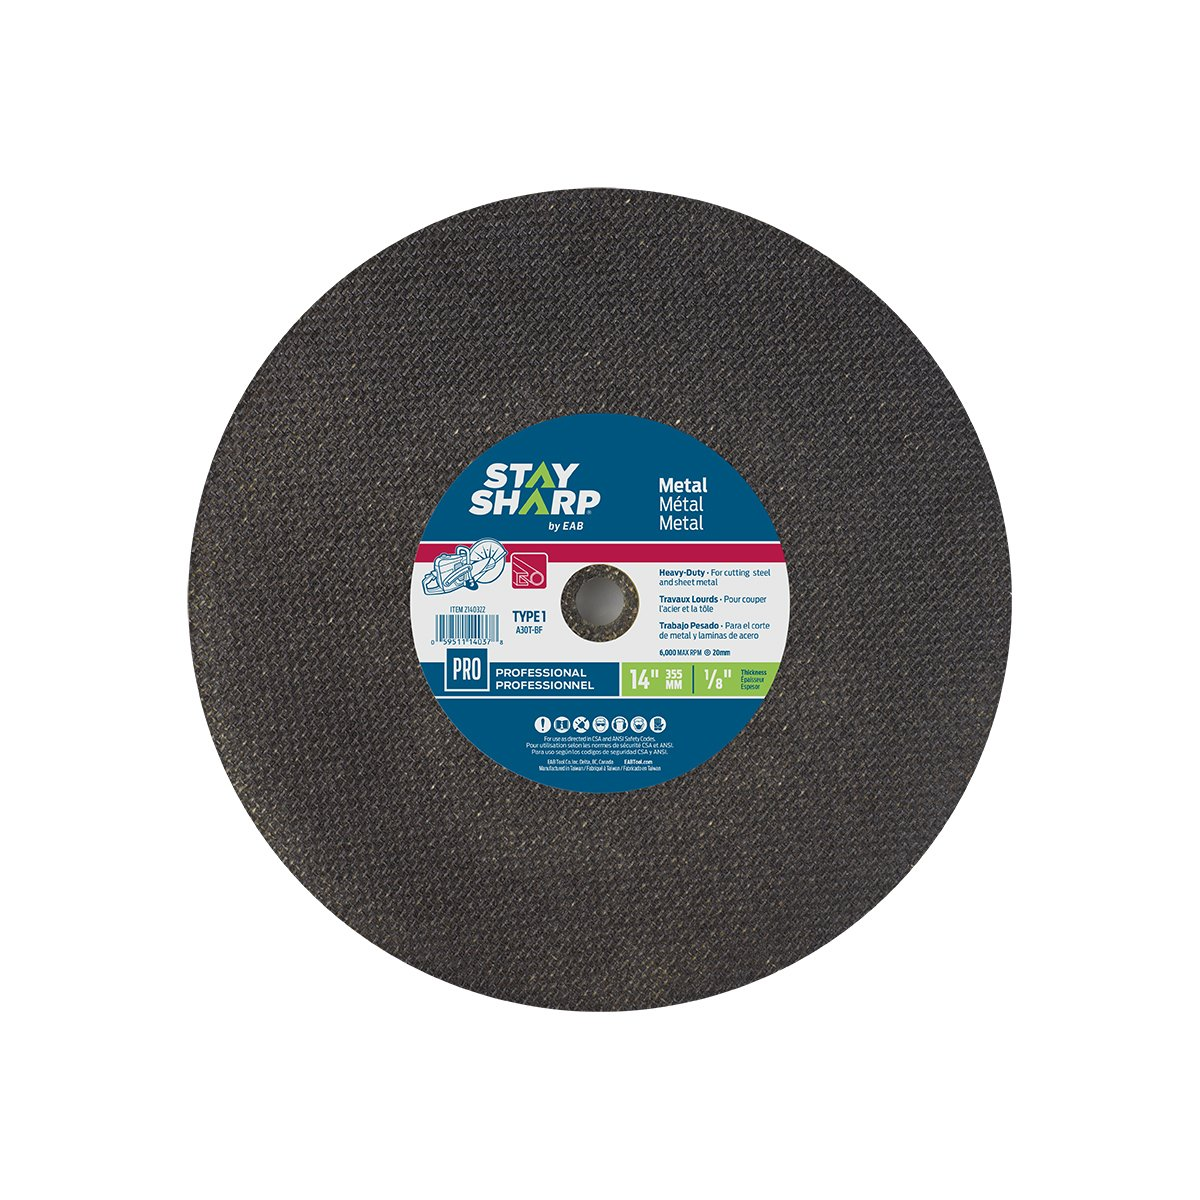 EAB Tool Company USA Inc Type 1 Professional Abrasive EAB Tool 2140322 14 x 1//8 Standard Metal Flat Wheel